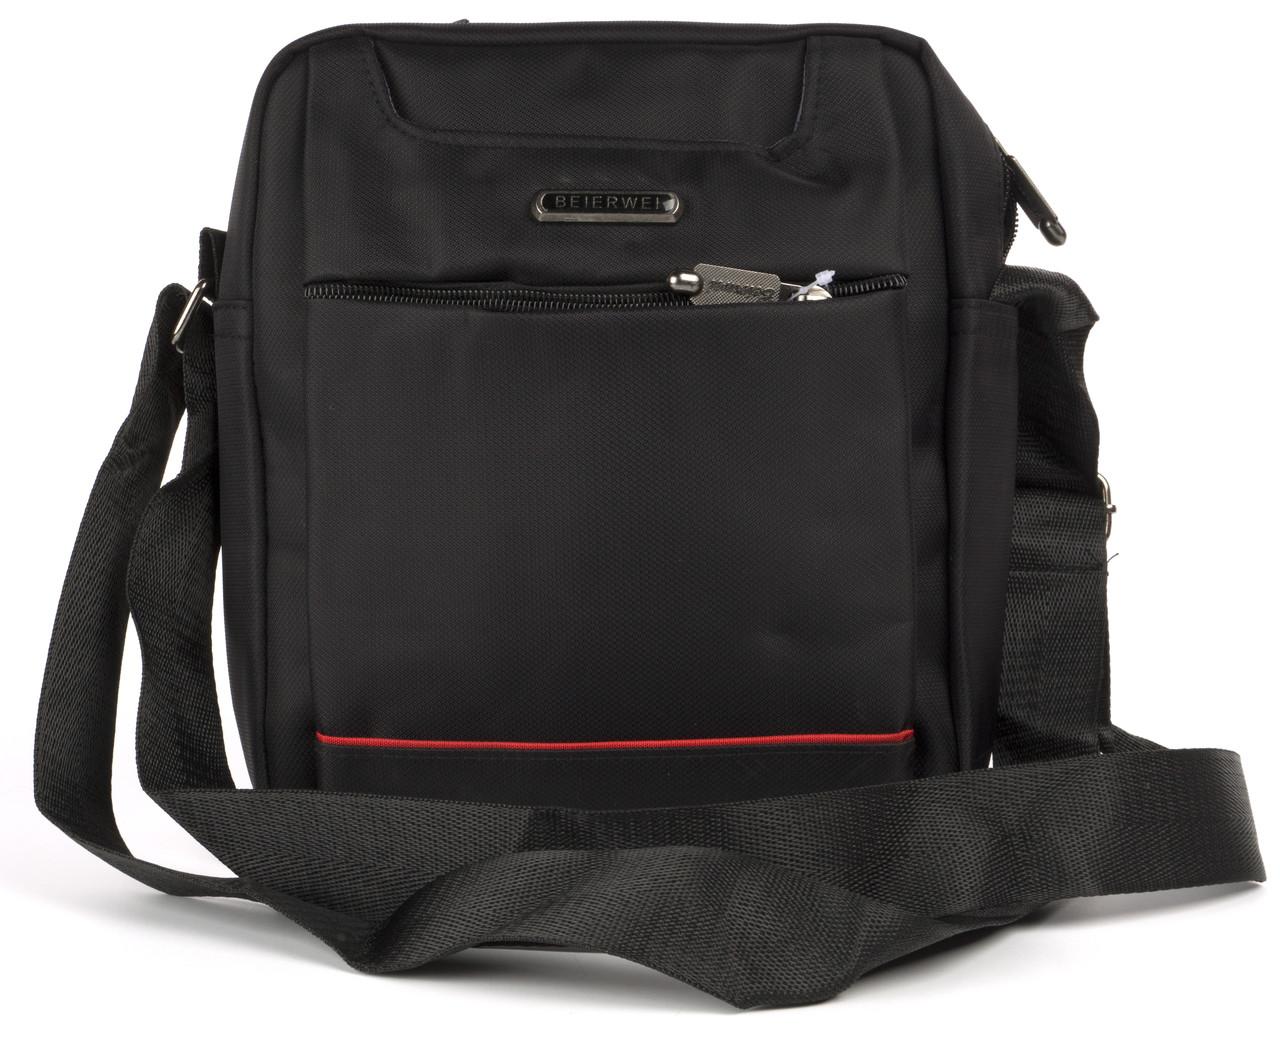 Красива чорна чоловіча сумка Beierwei art. 635